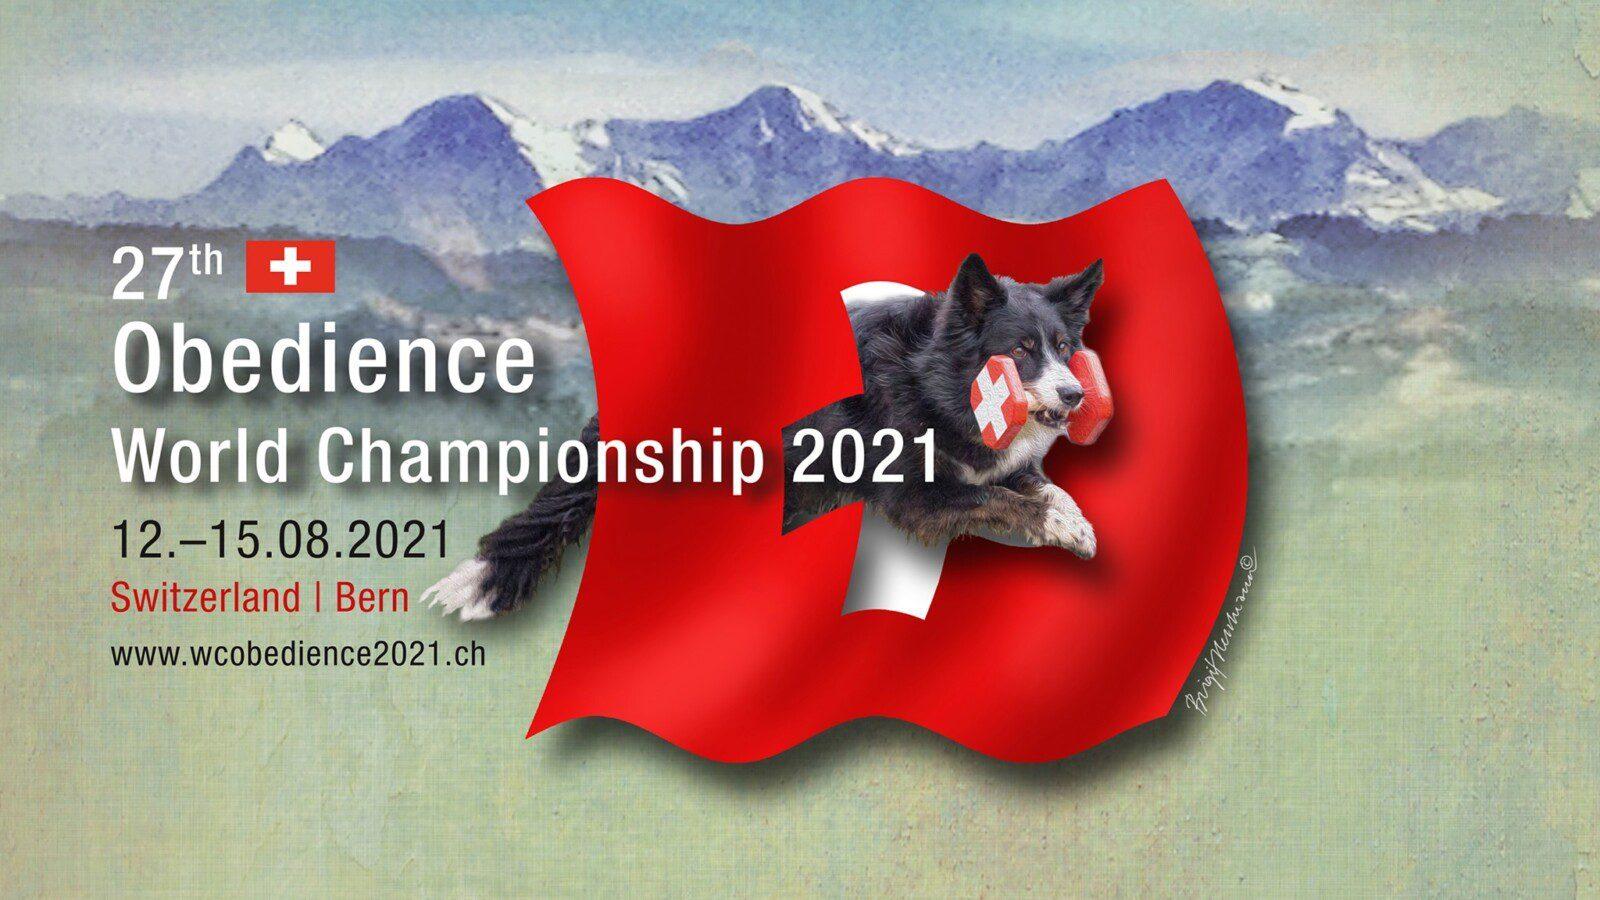 FCI Obedience World Championship 2021